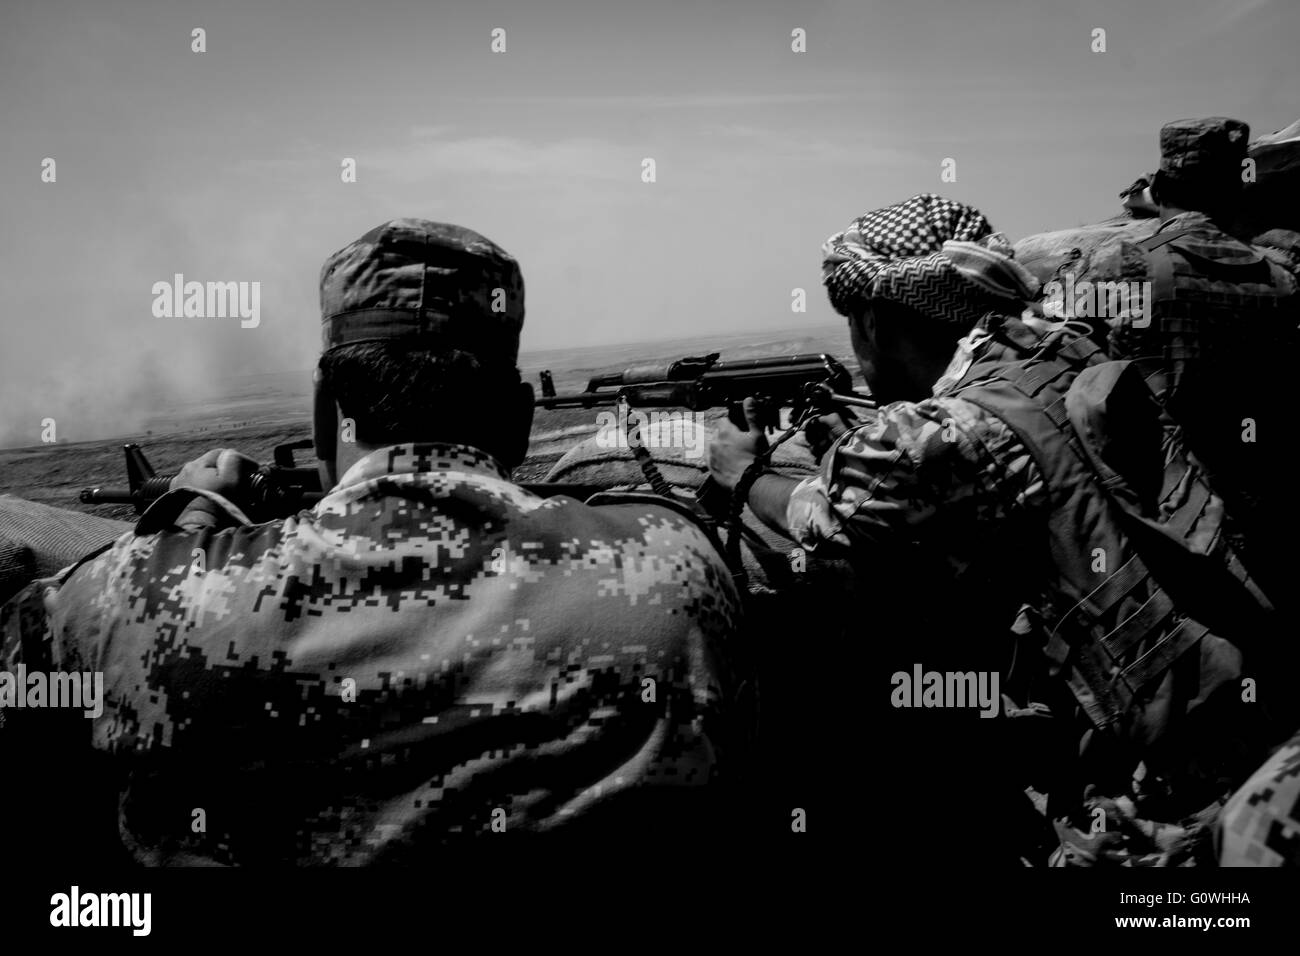 Kurdish Peshmerga forces repelled jihadist attacks on Abu Shita village -  03/05/2016  -  Iraq / Erbil / Abu Shita - Stock Image